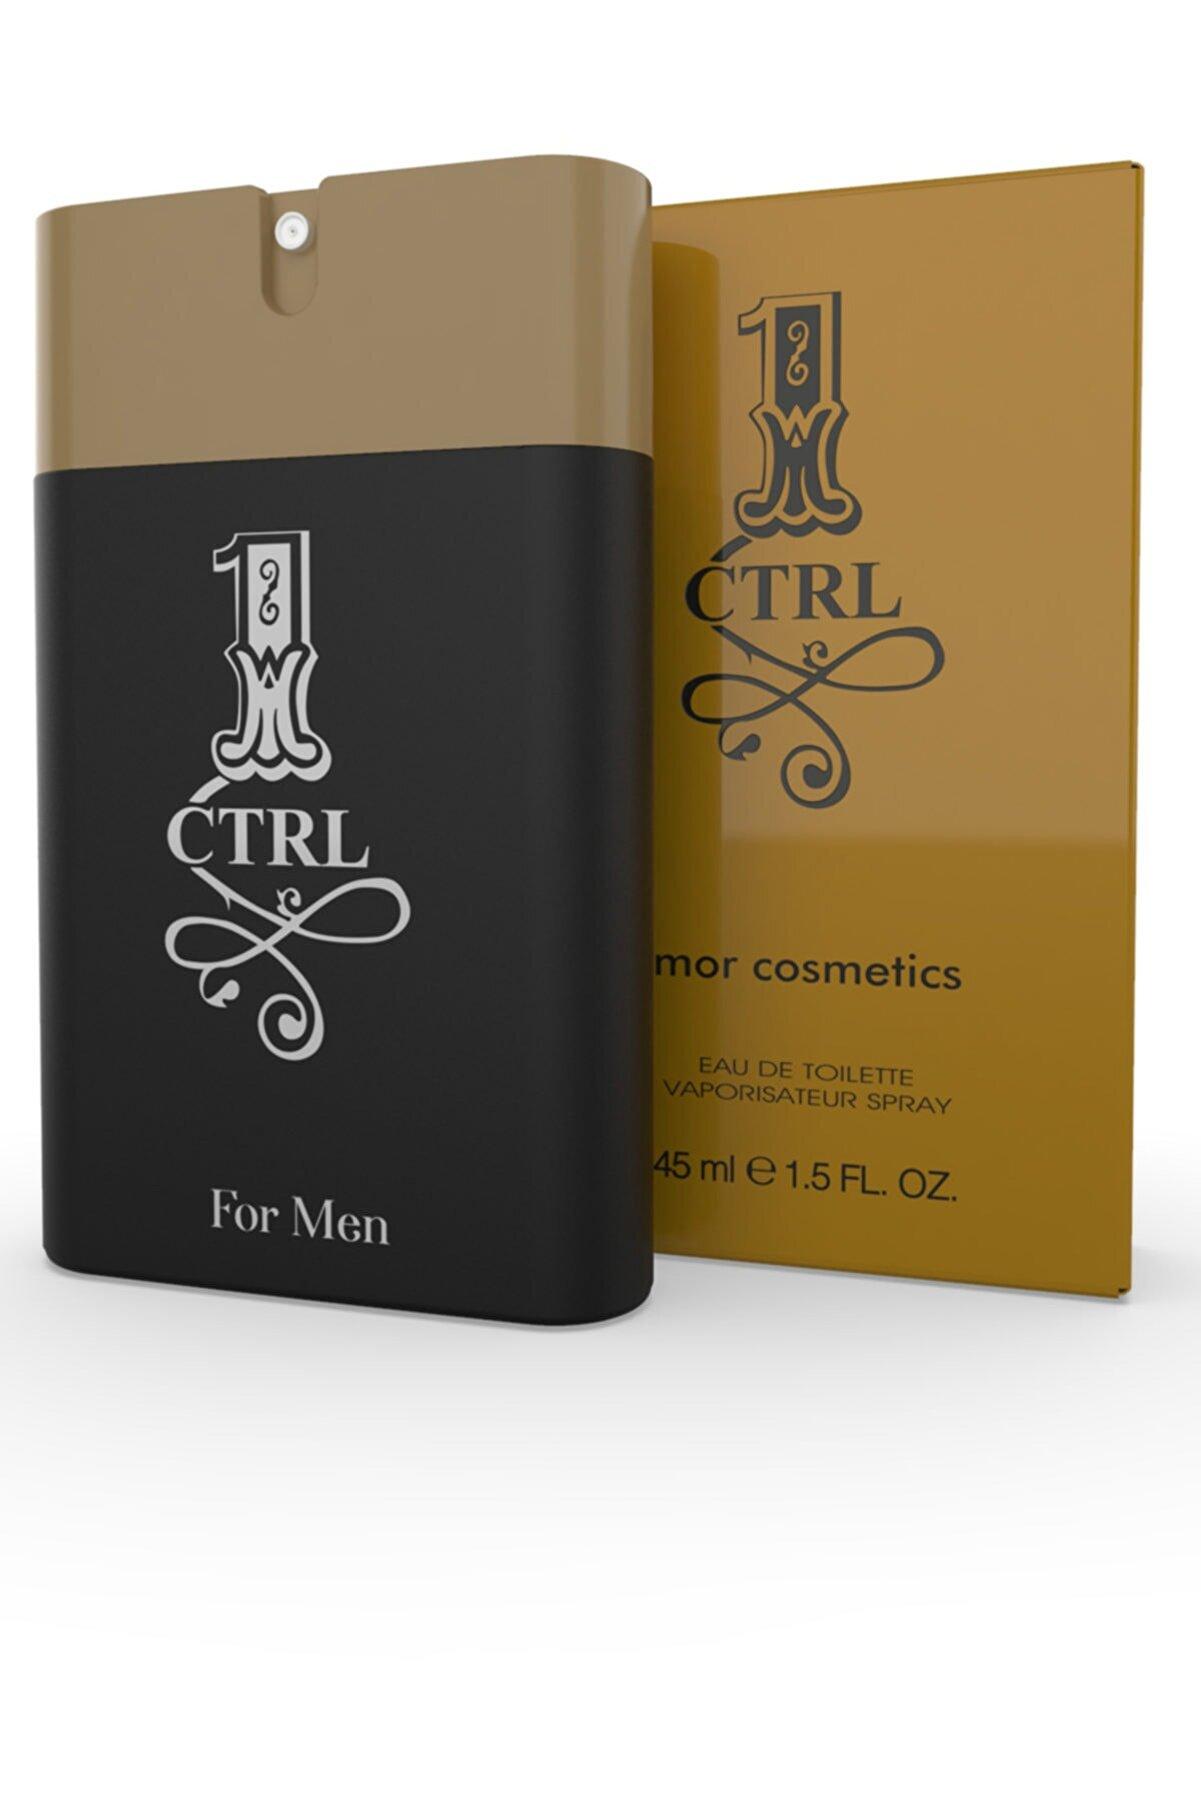 CTRL 1 45ml Cep Boy Erkek Parfmü